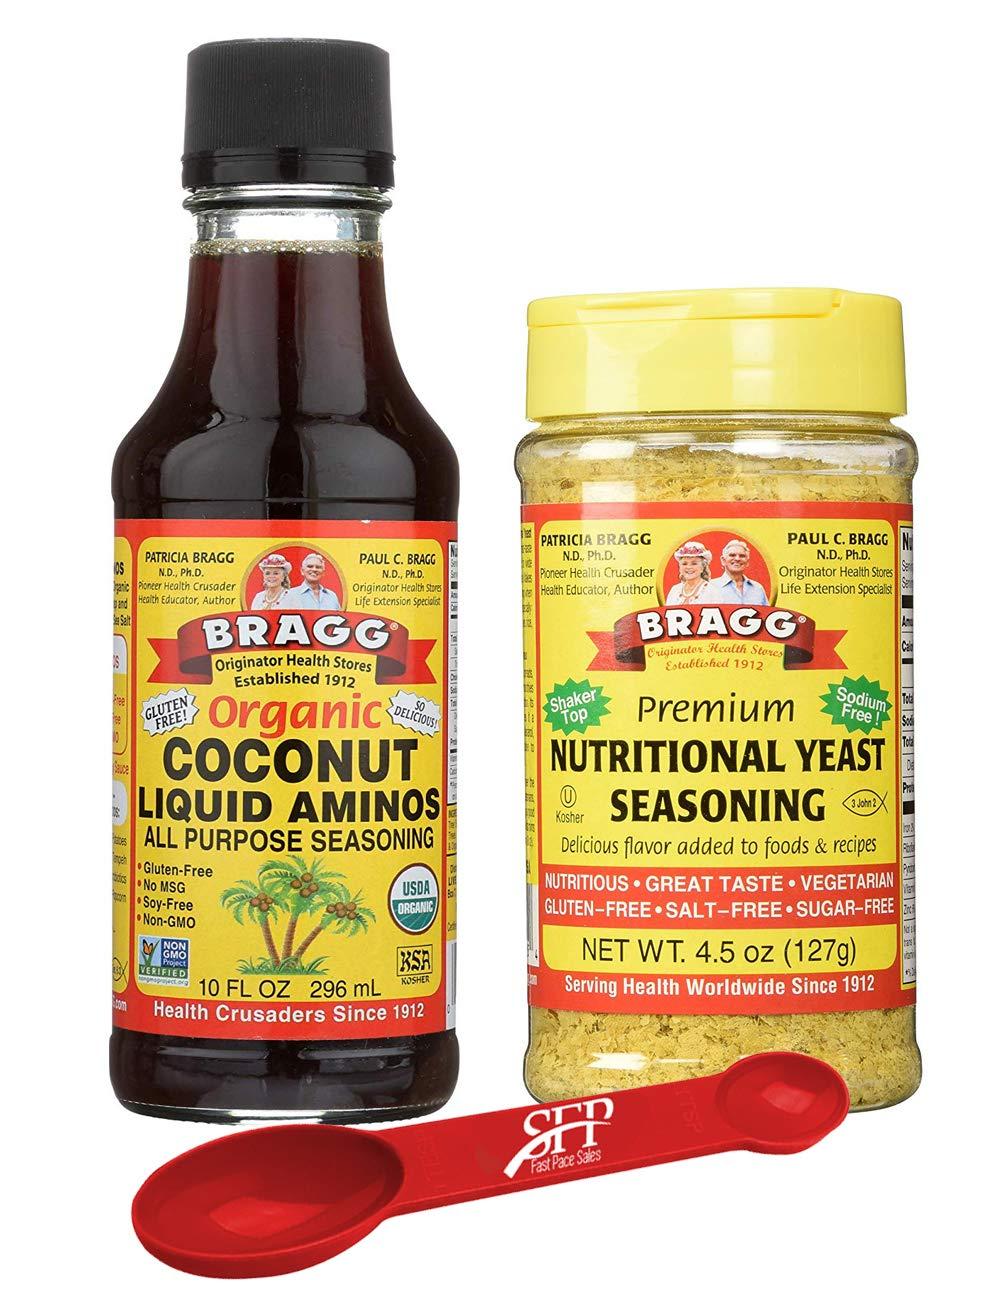 Bragg's Organic Saver Package: Bragg Organic Coconut Liquid Aminos, 10 Oz + Bragg's Nutrional Yeast Supplement, 4.5 Oz by Bragg's Organic (Image #1)